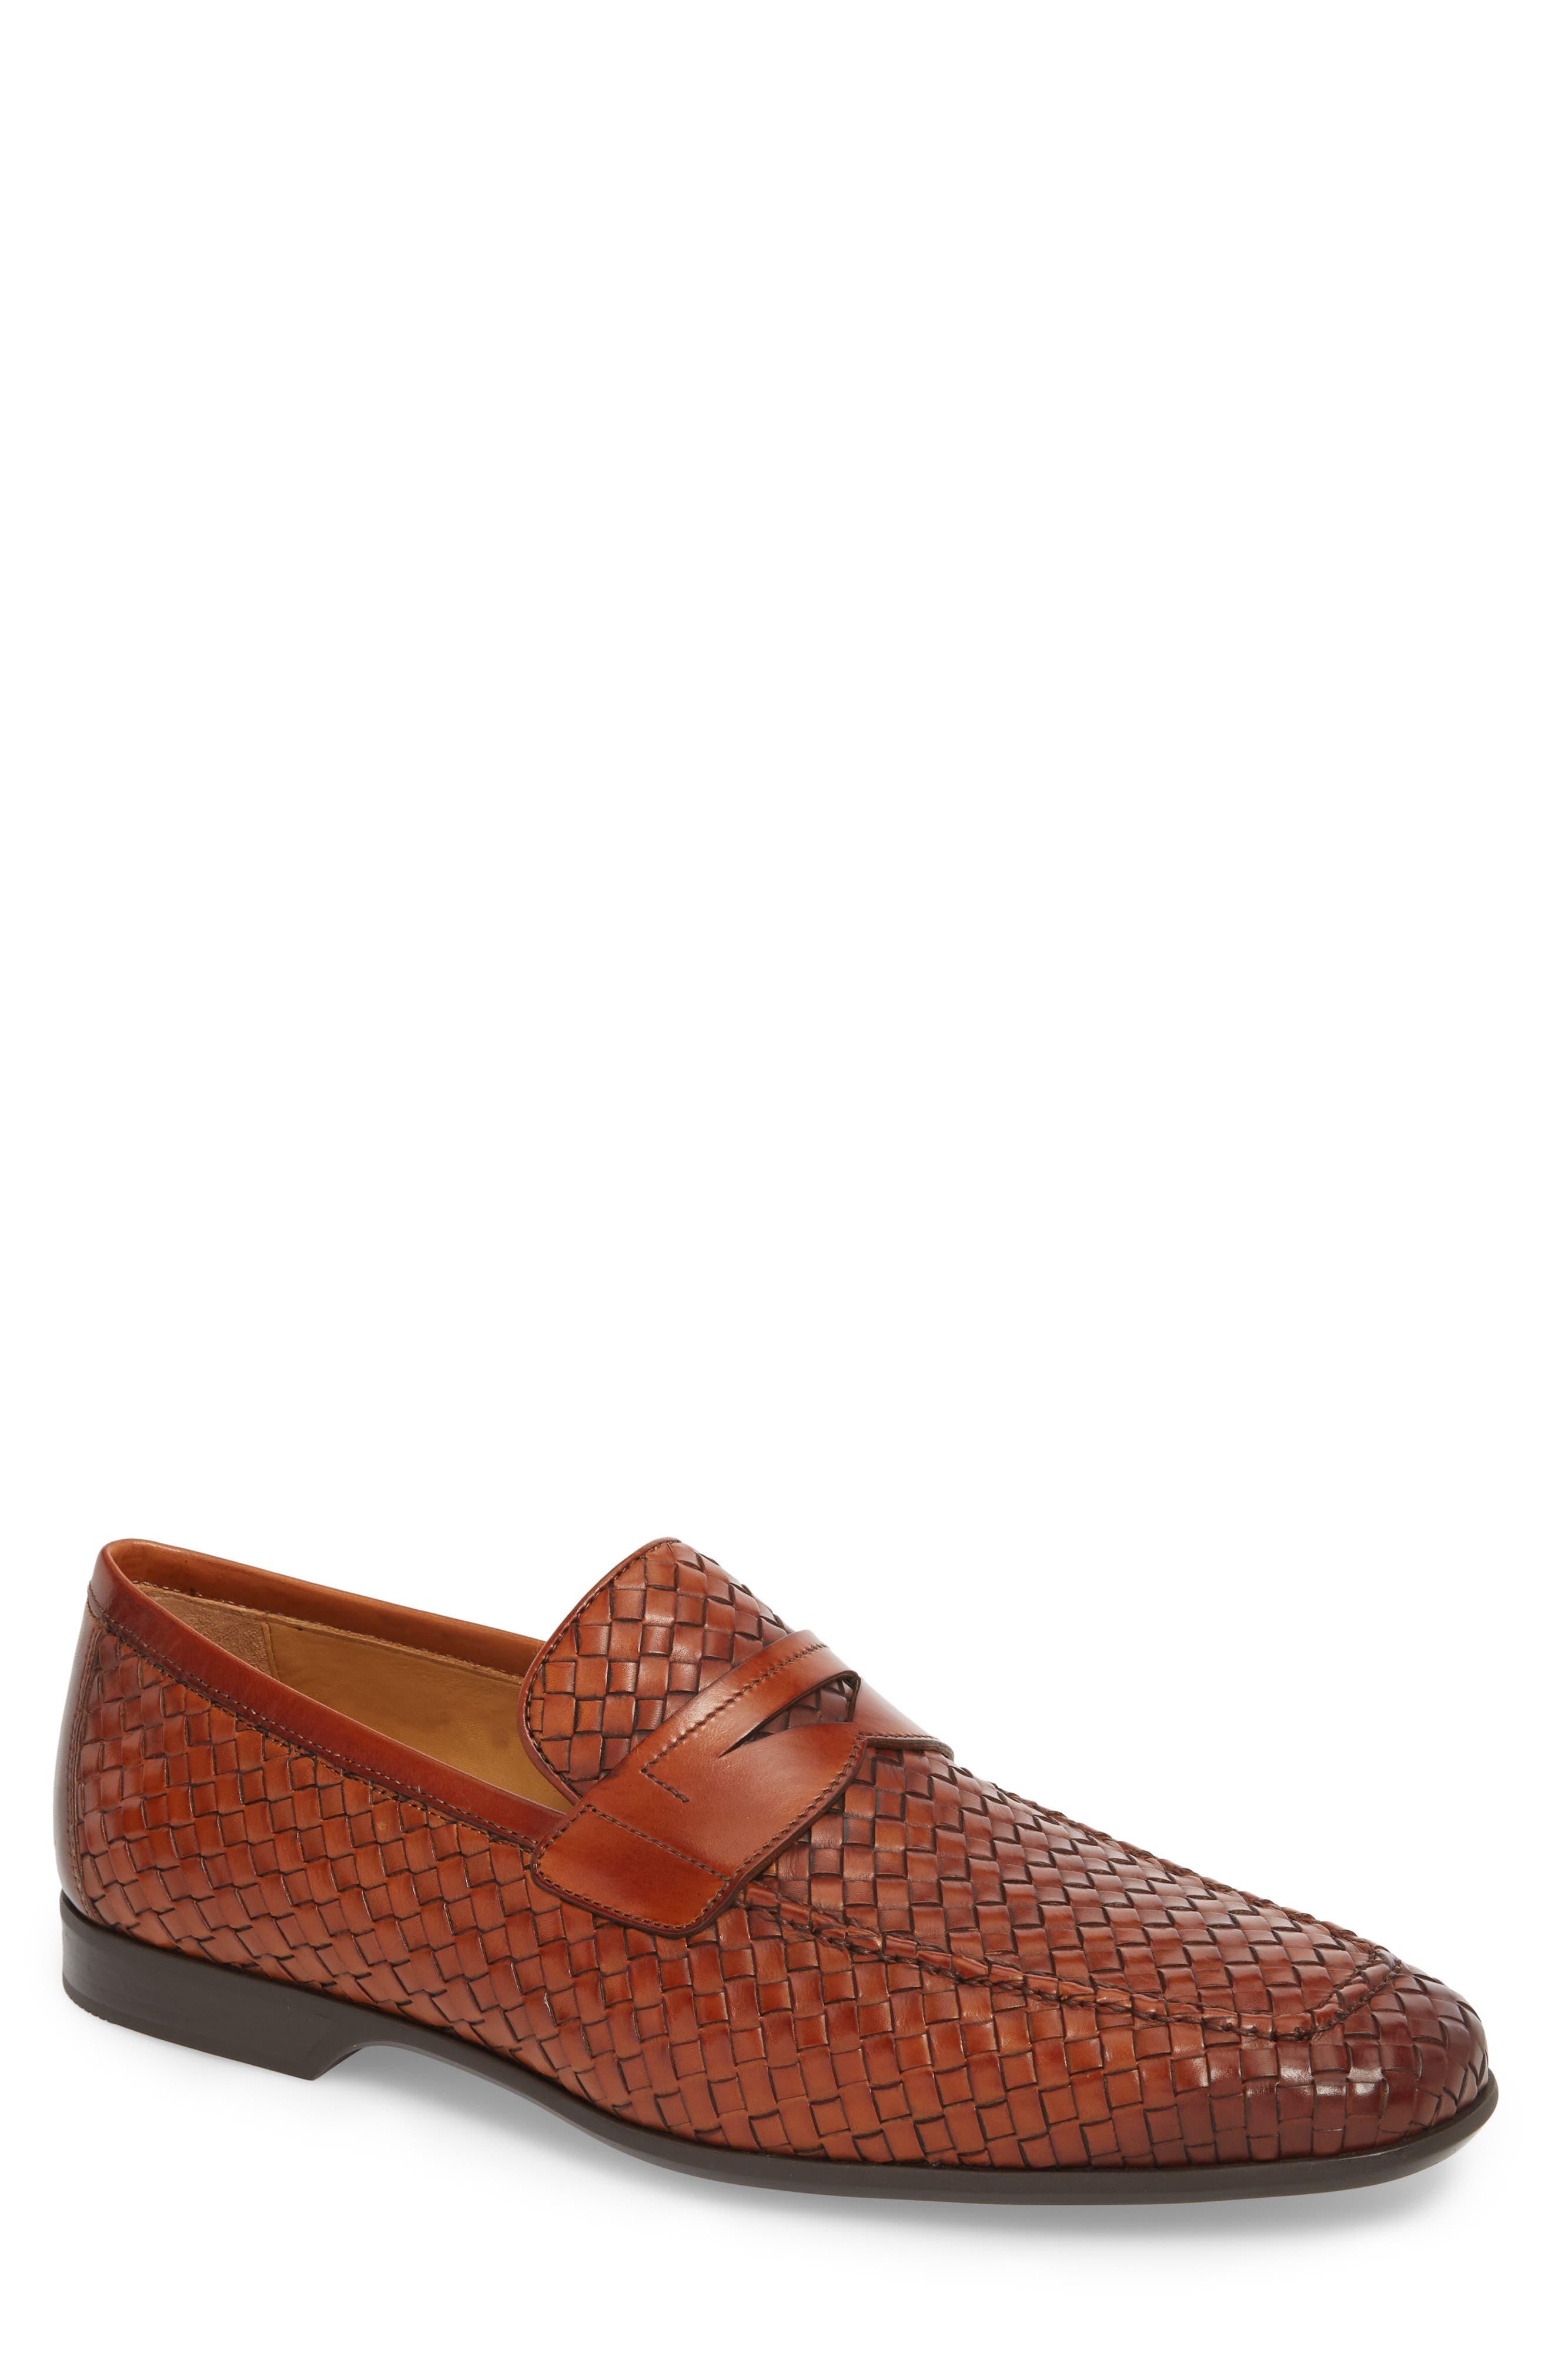 Rafa II Woven Penny Loafer,                             Main thumbnail 1, color,                             Cognac Leather